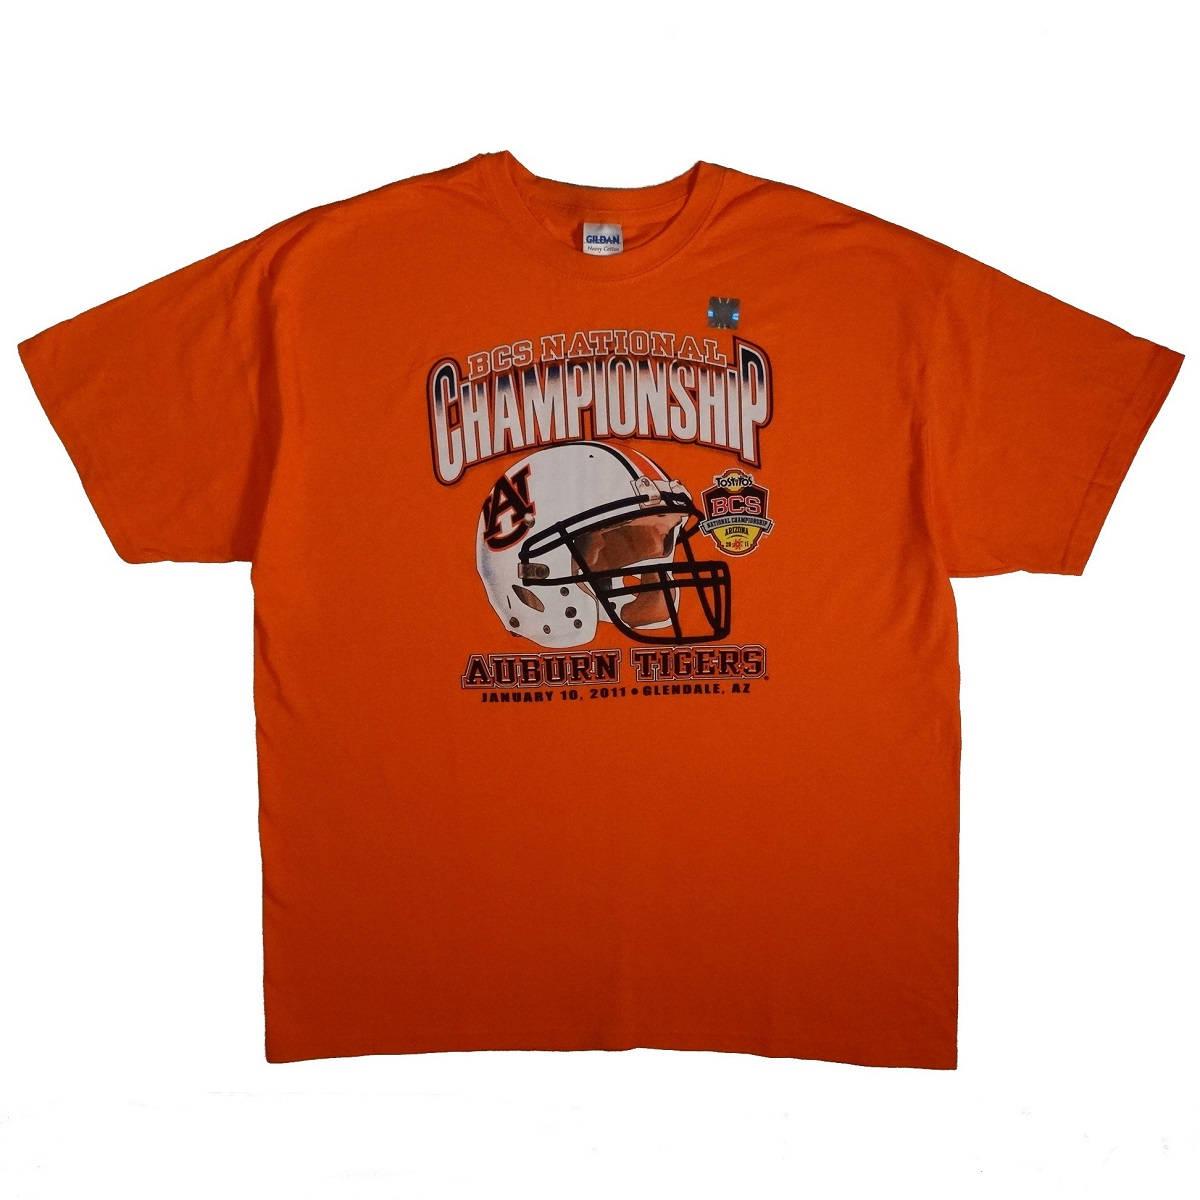 auburn tigers 2011 ncaa football national championship t shirt front